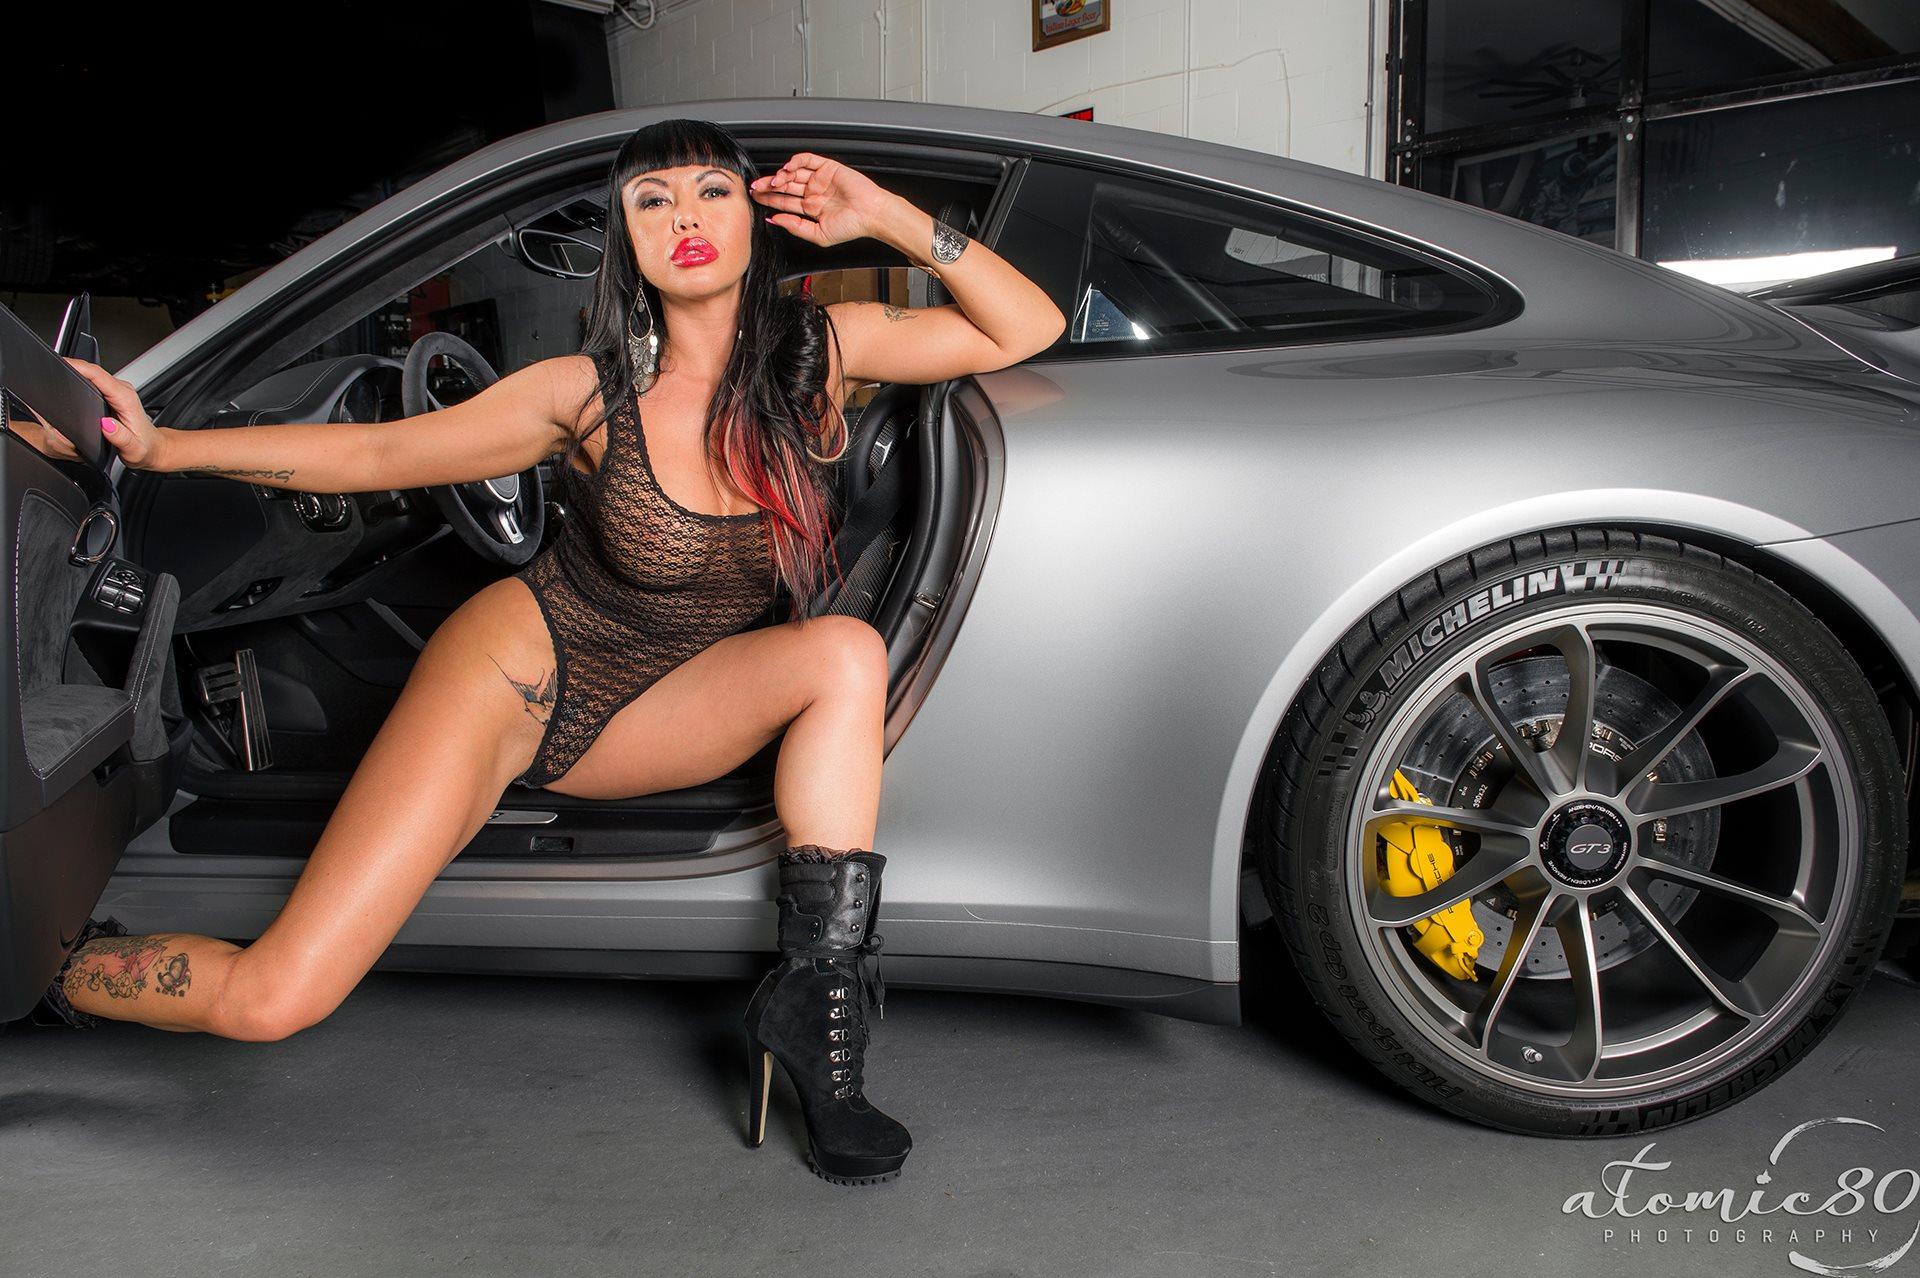 Porsche 918 spyder convertible car pictures adanih com